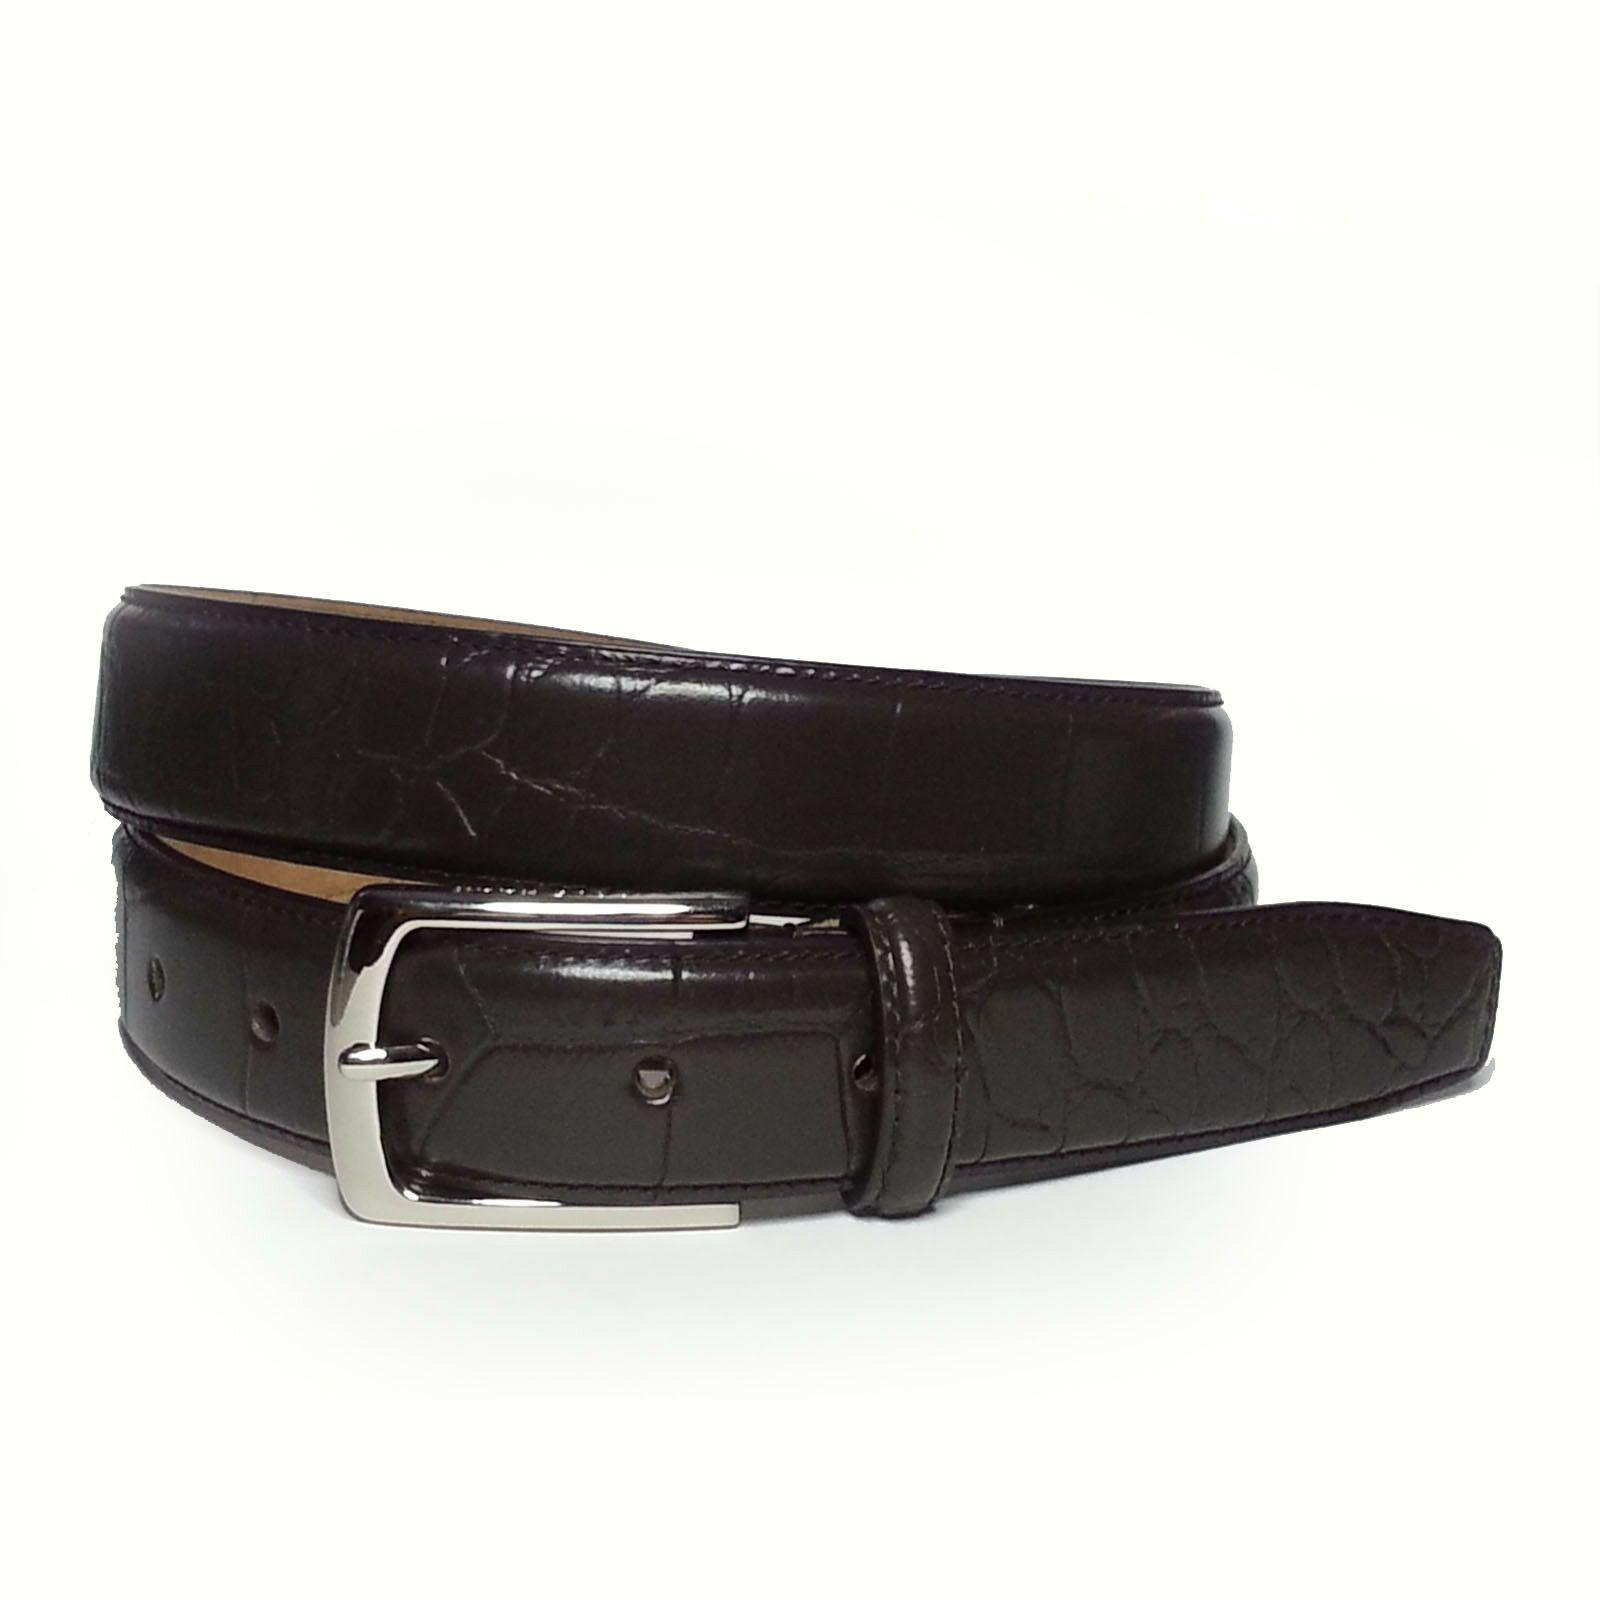 Schutz Nurten Black Nubuck Leather Caged Curvy Strap Mule Sandal Dress Pump